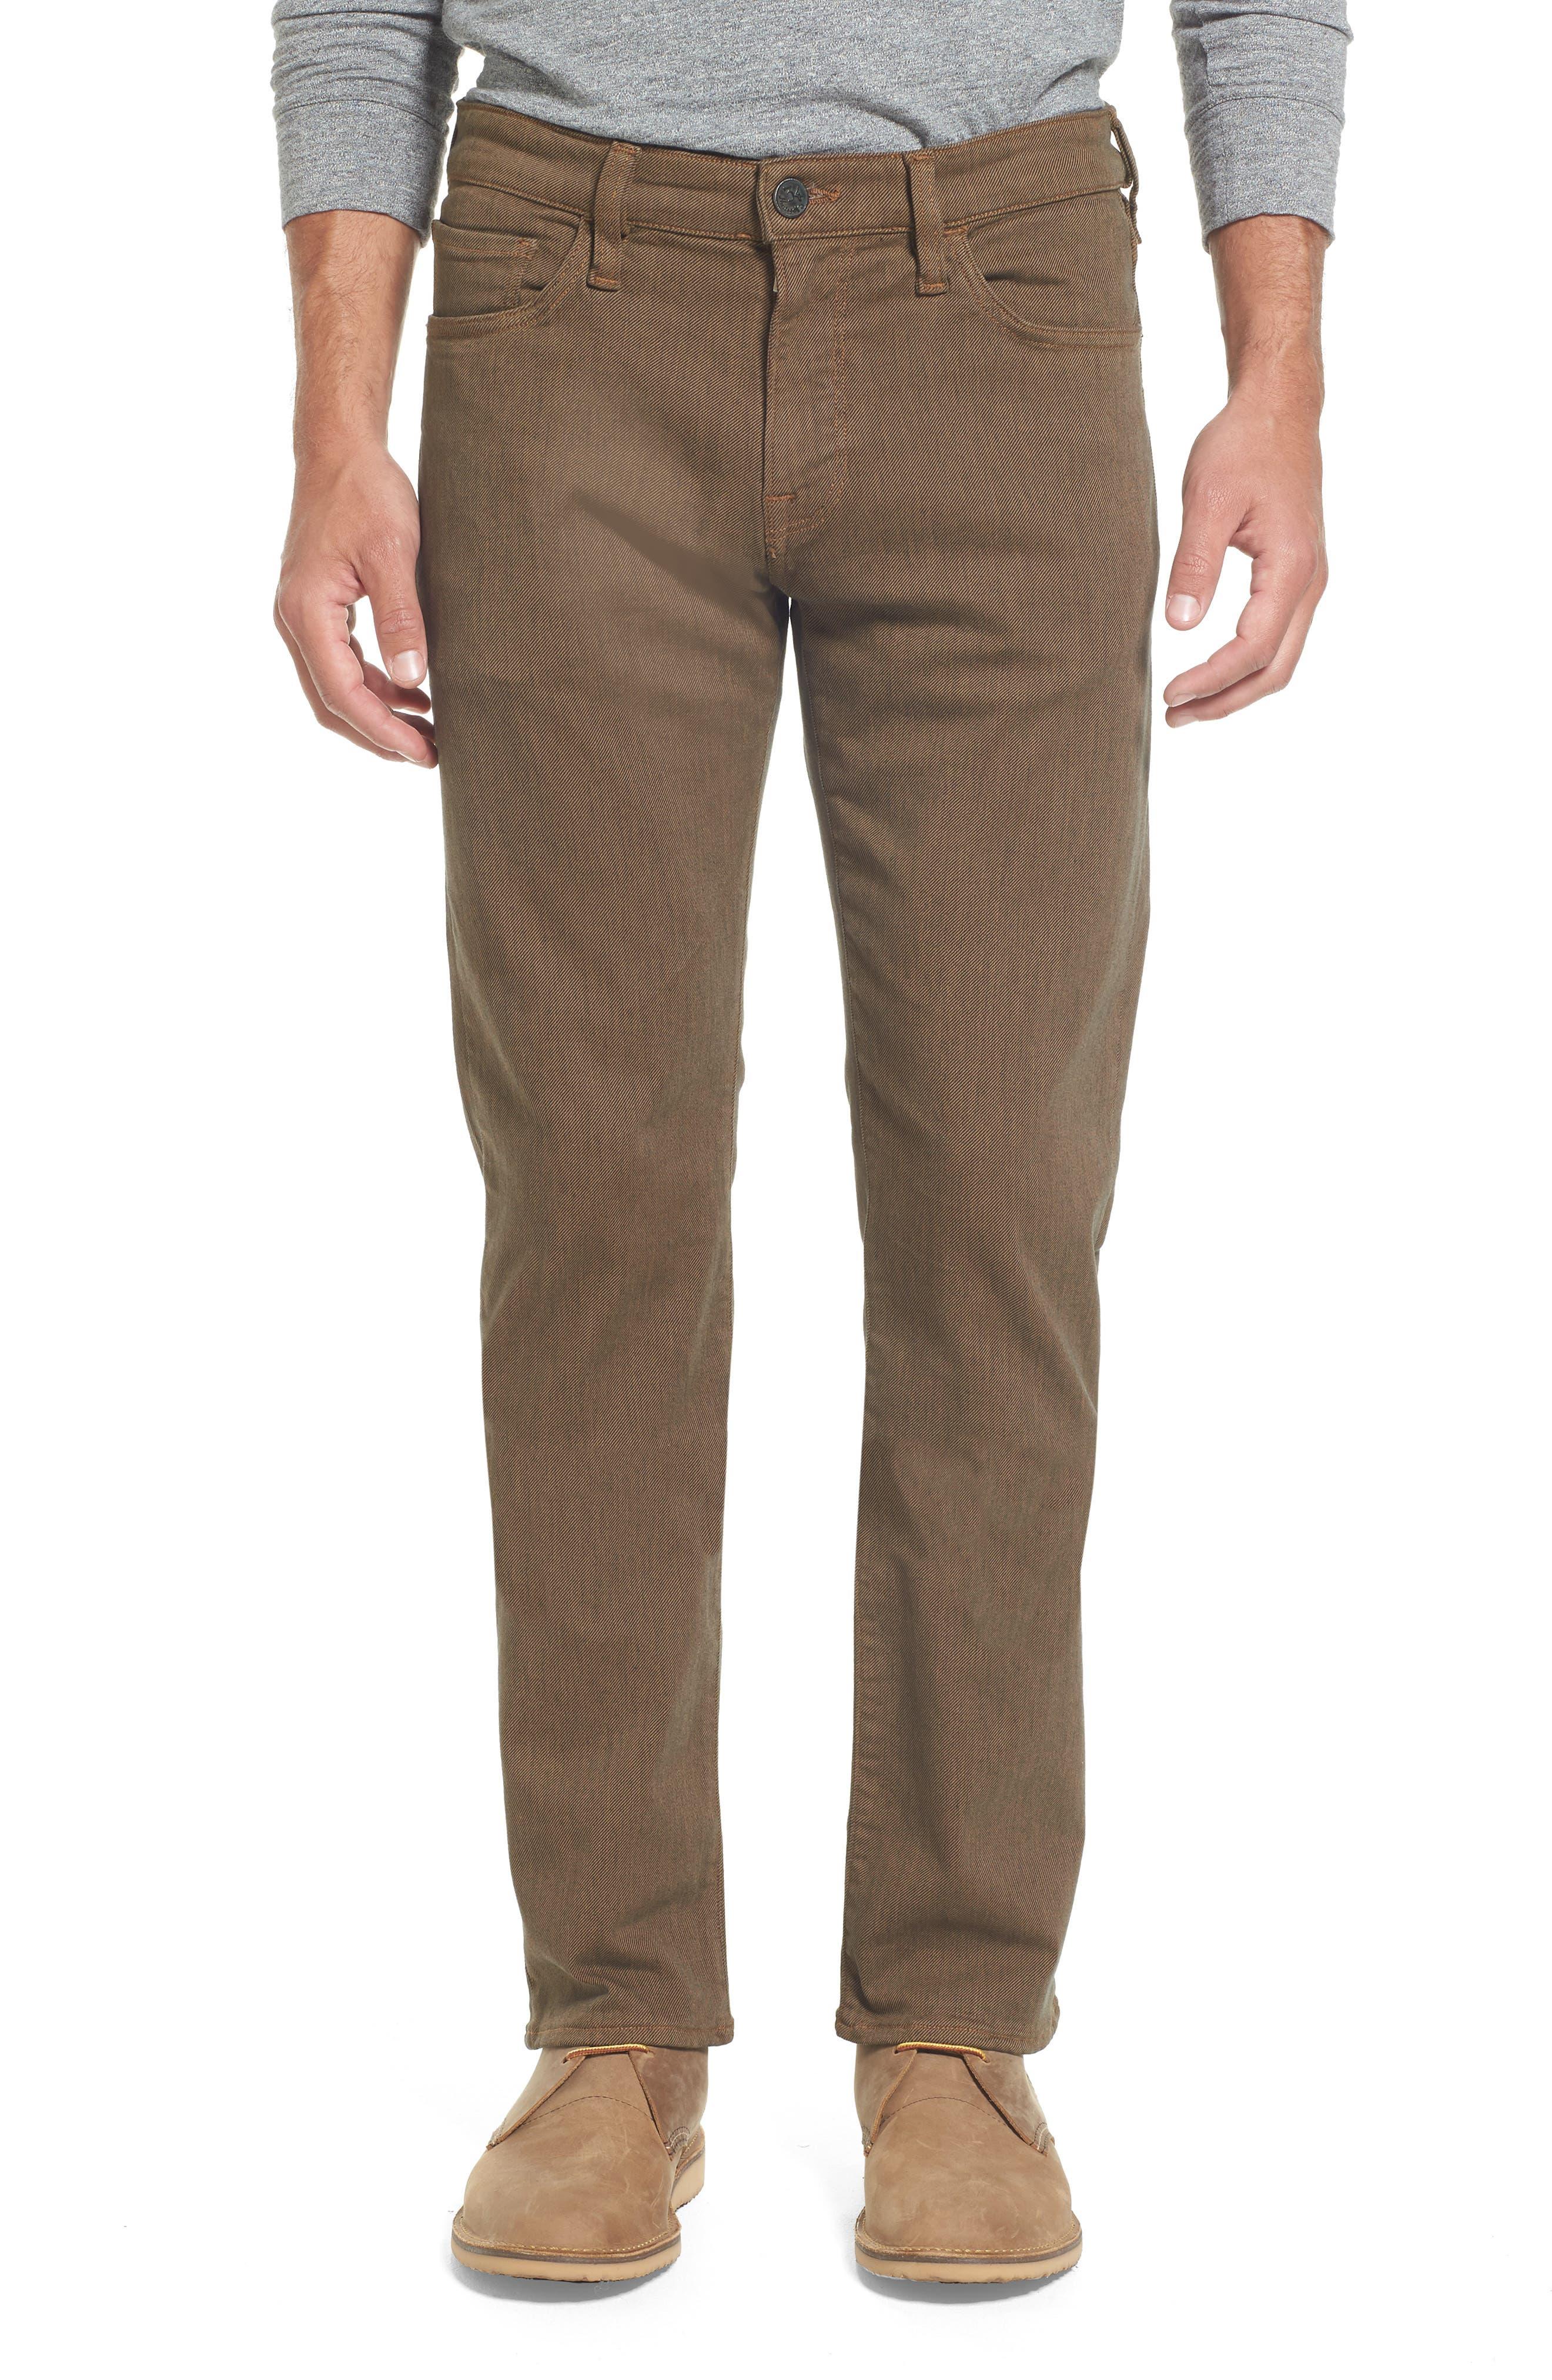 Heritage 34 Courage Straight Leg Jeans (Rust Diagonal)